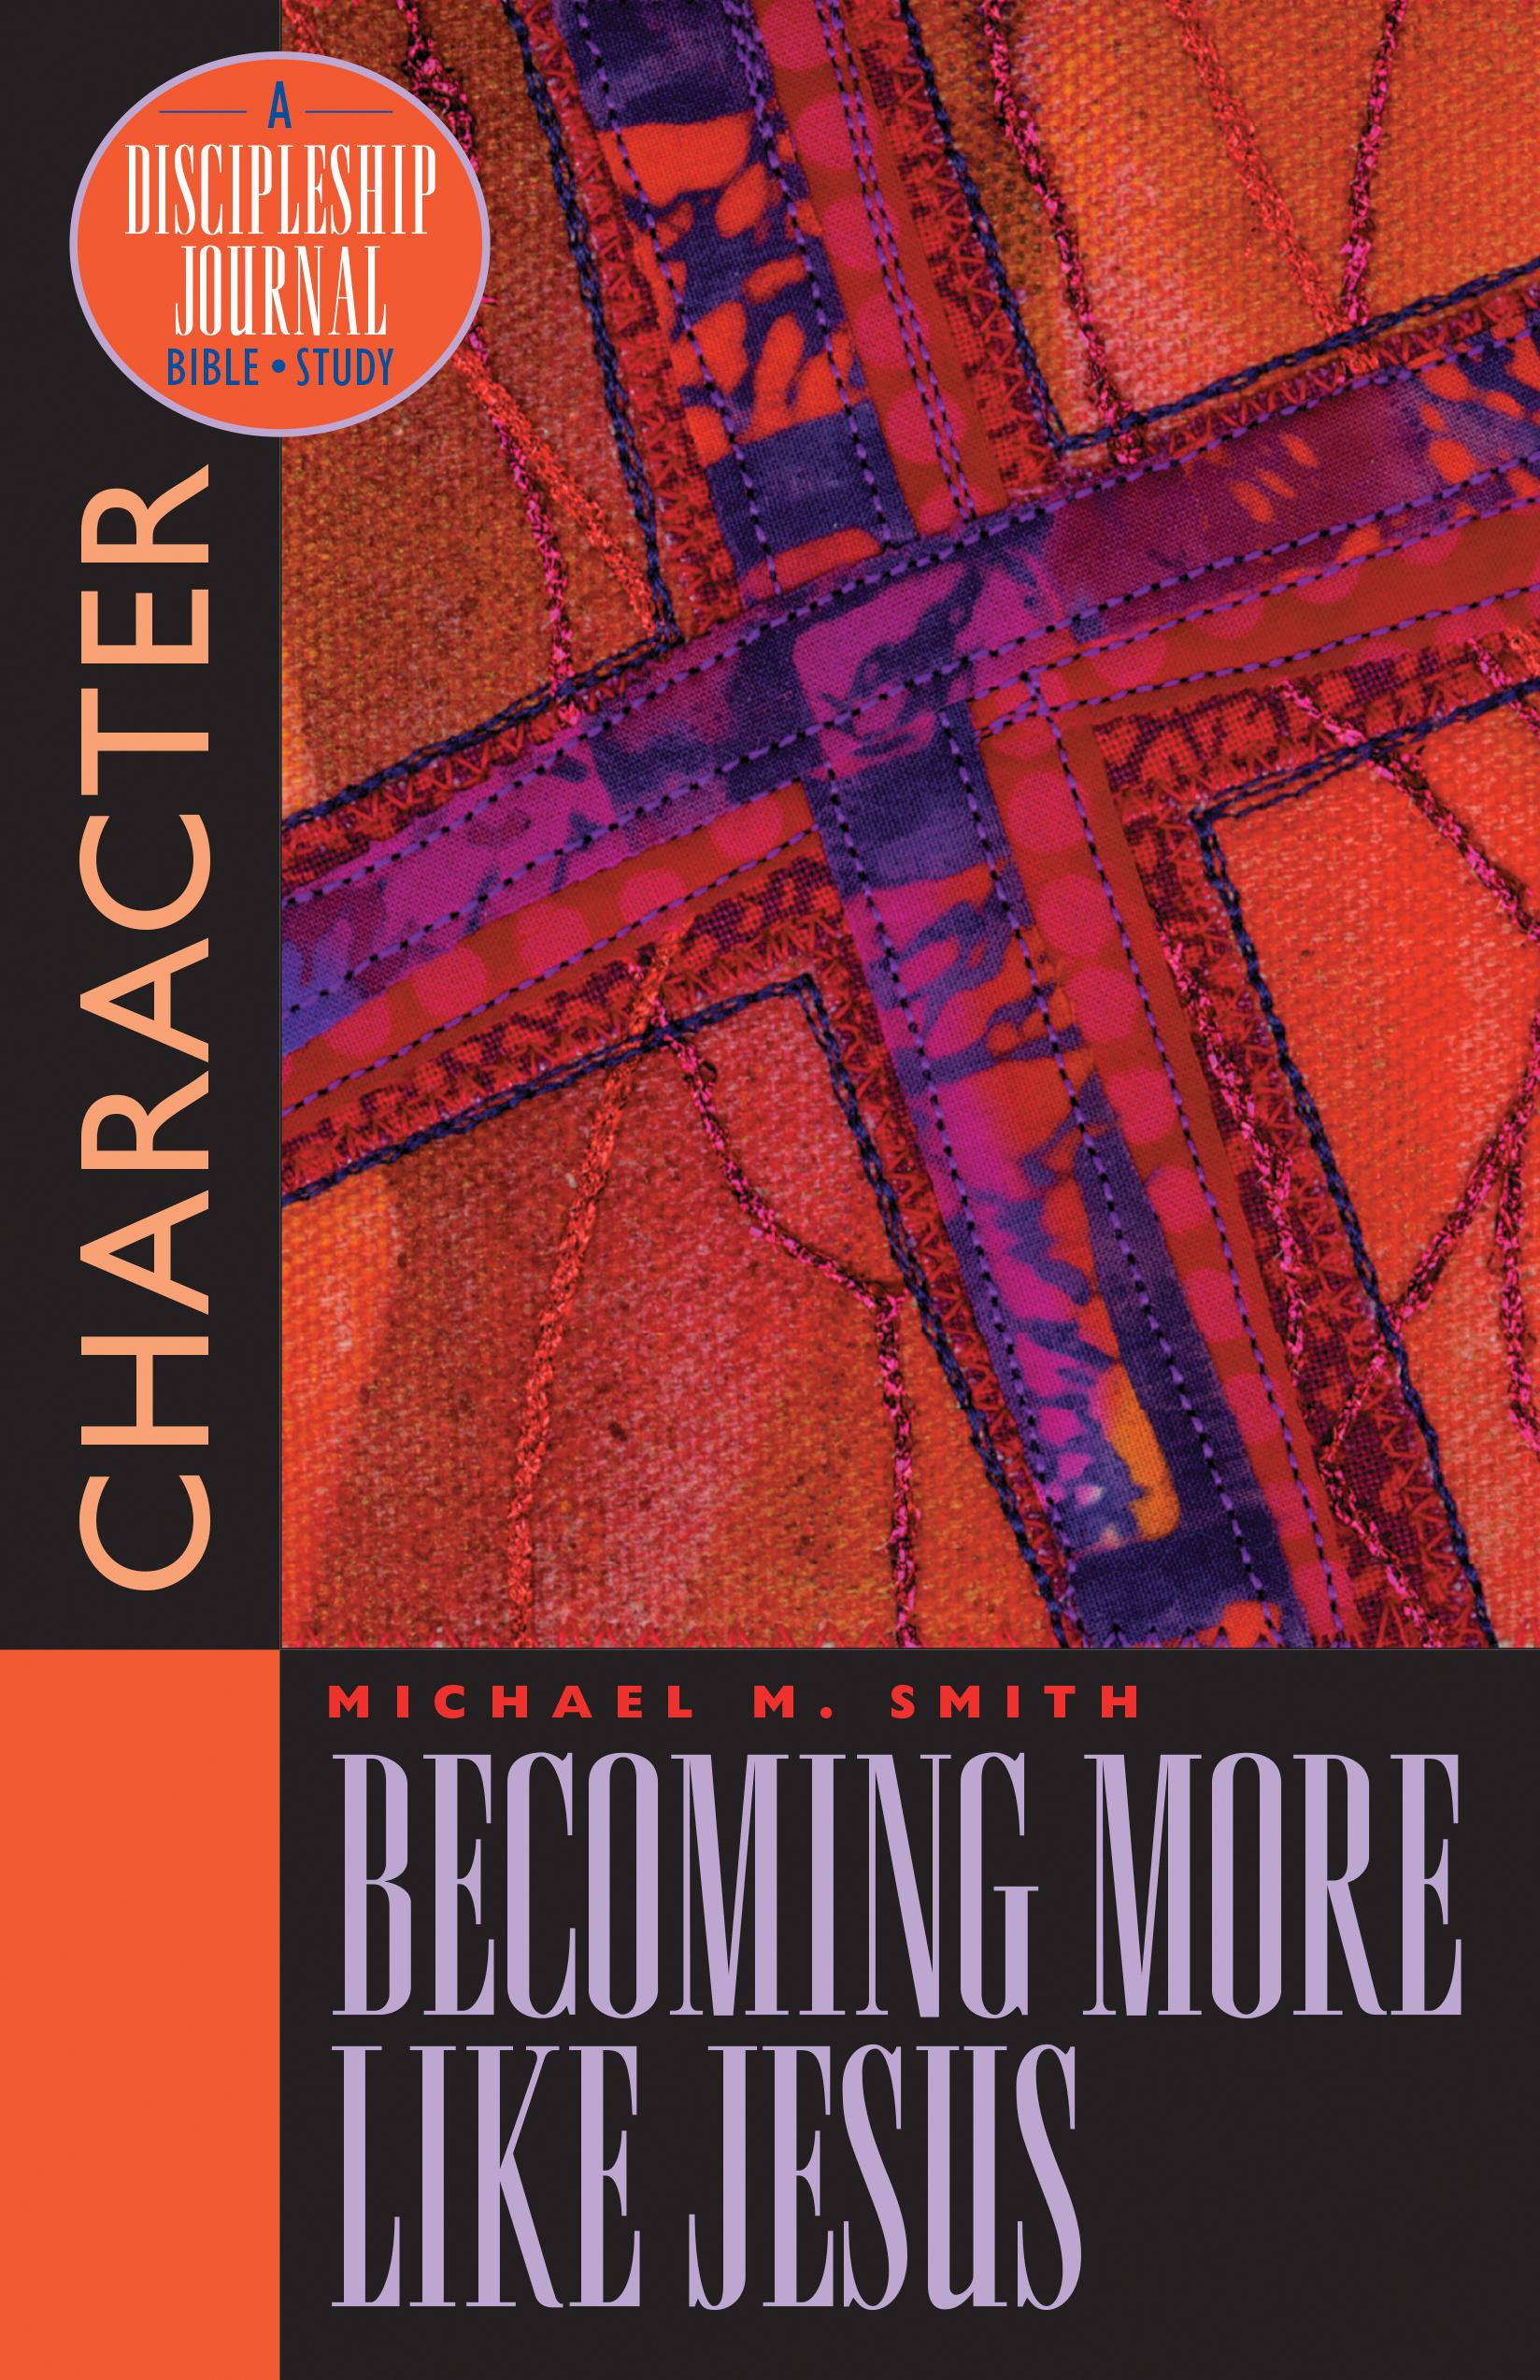 Becoming More Like Jesus